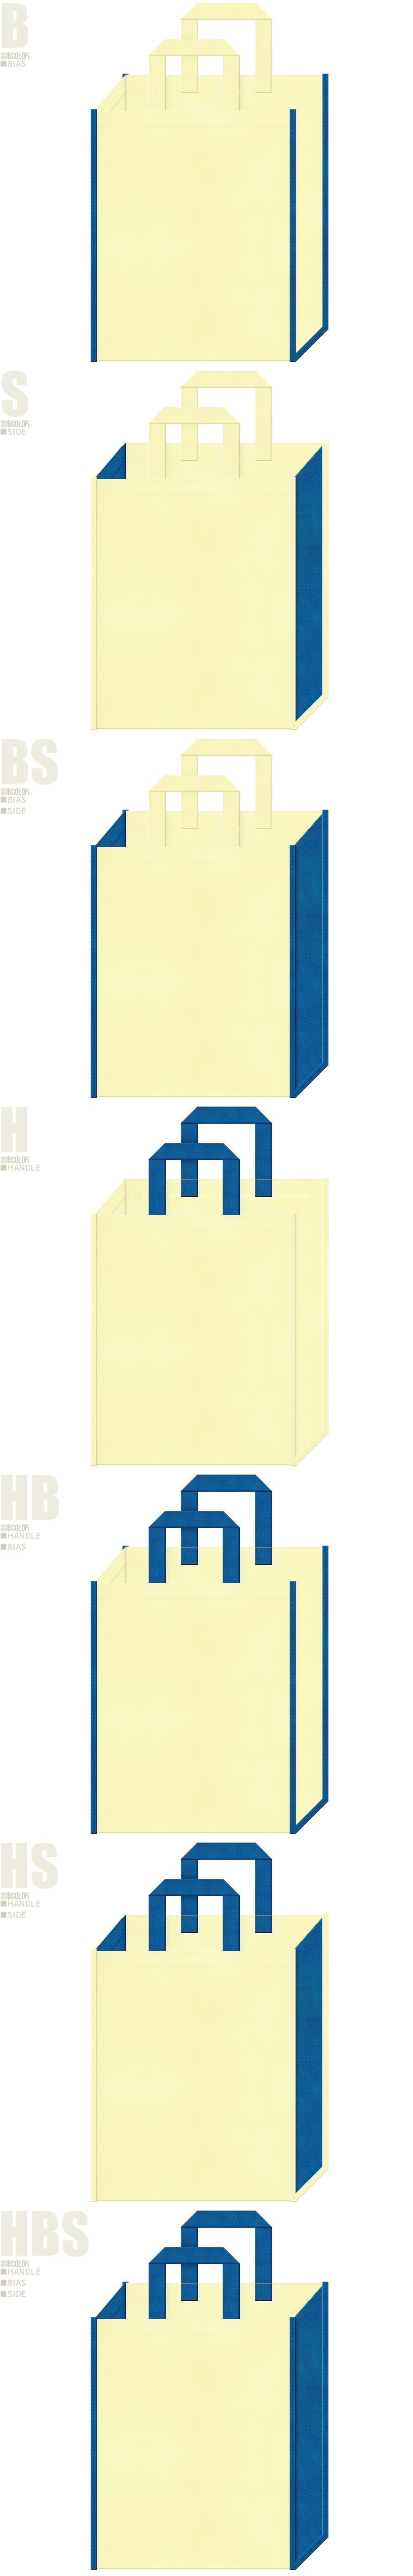 LED照明のイメージにお奨めの不織布バッグのデザイン:薄黄色と青色の配色7パターン。